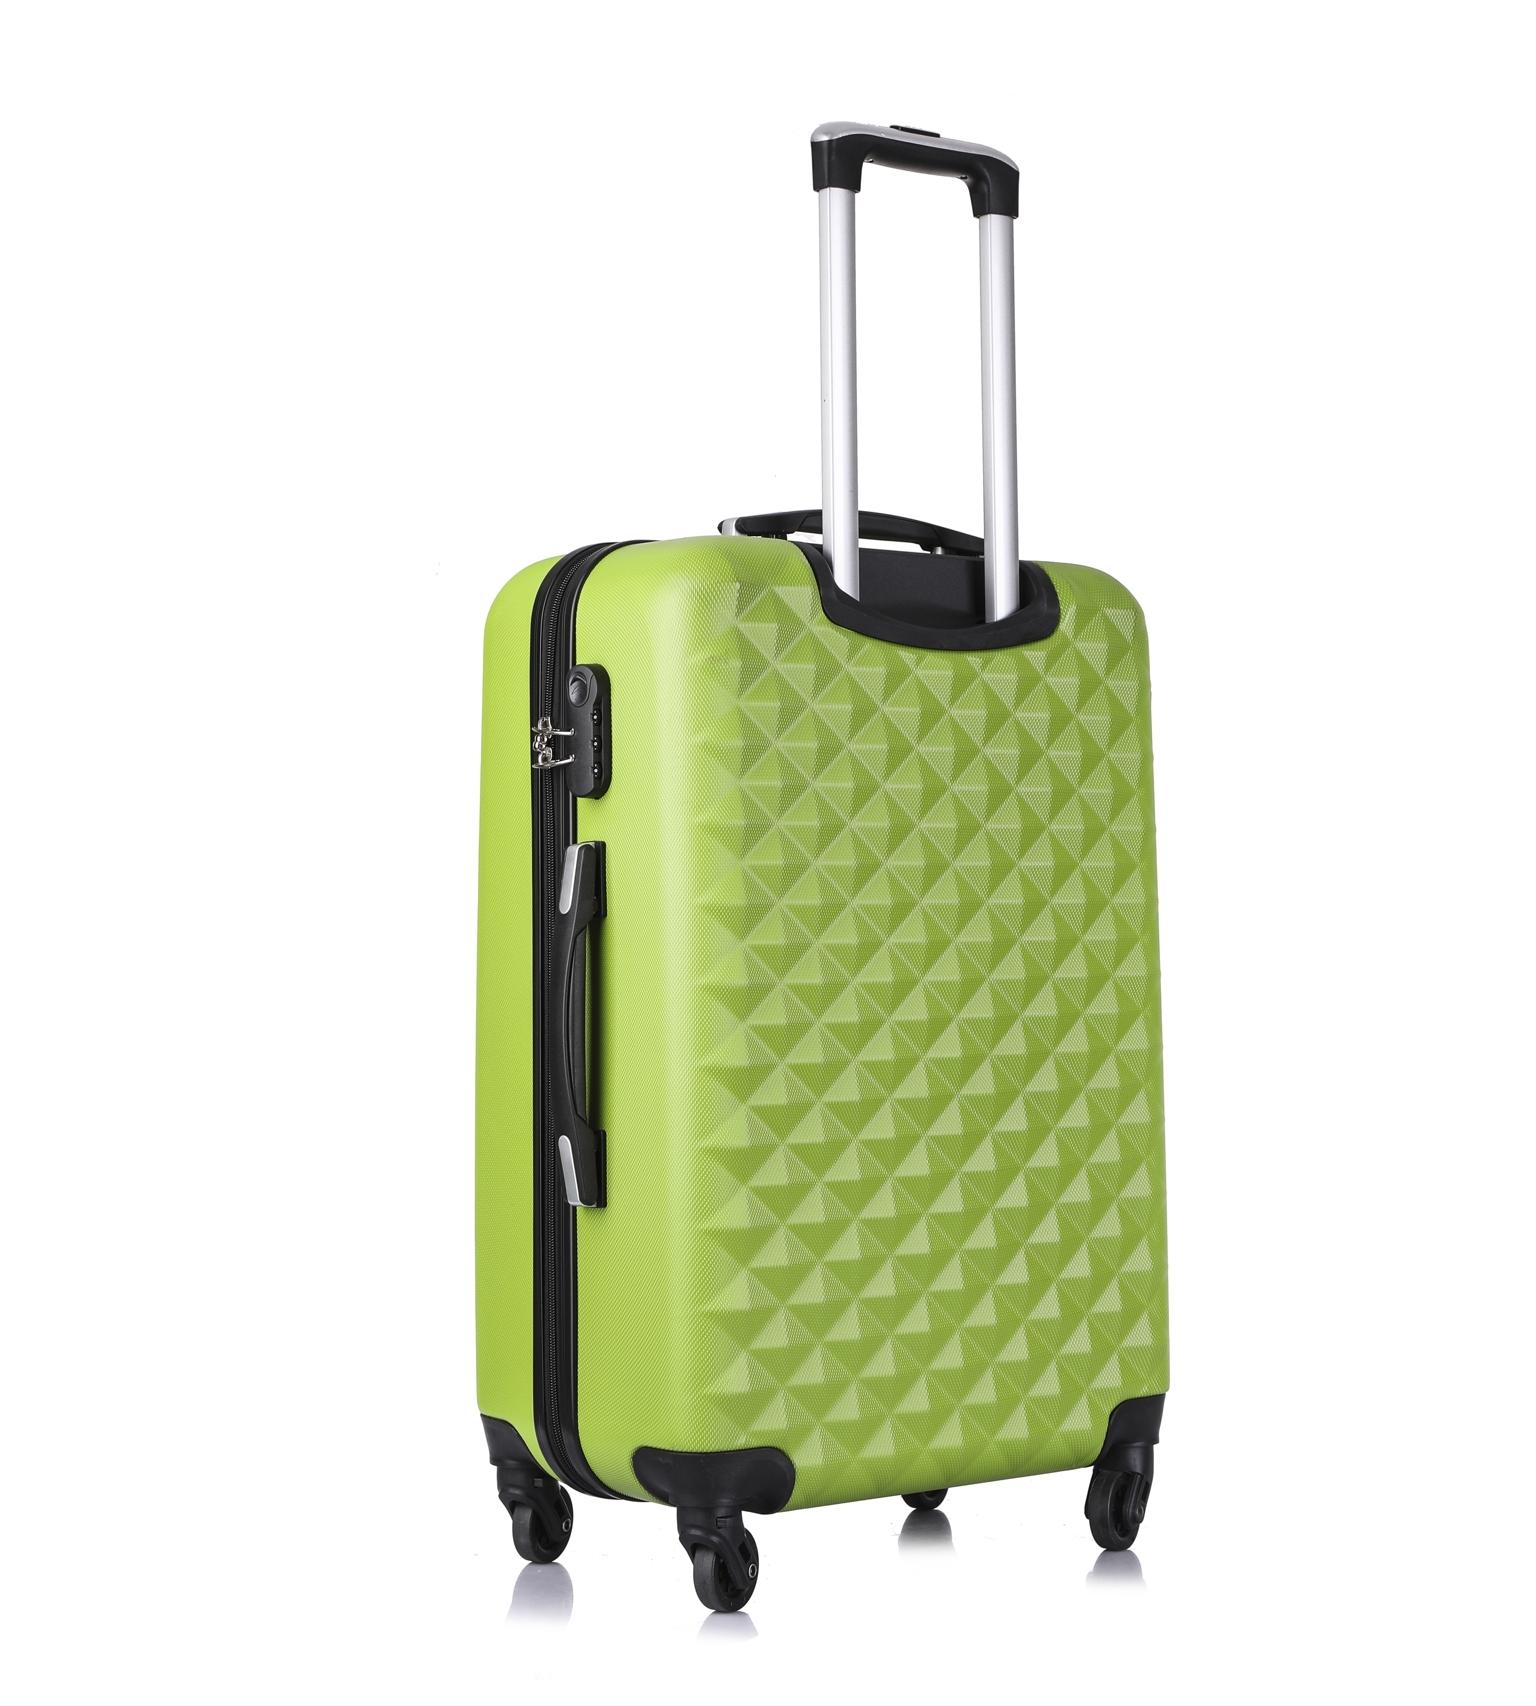 Чемодан со съемными колесами L'case Phatthaya-24 Зеленый (M)